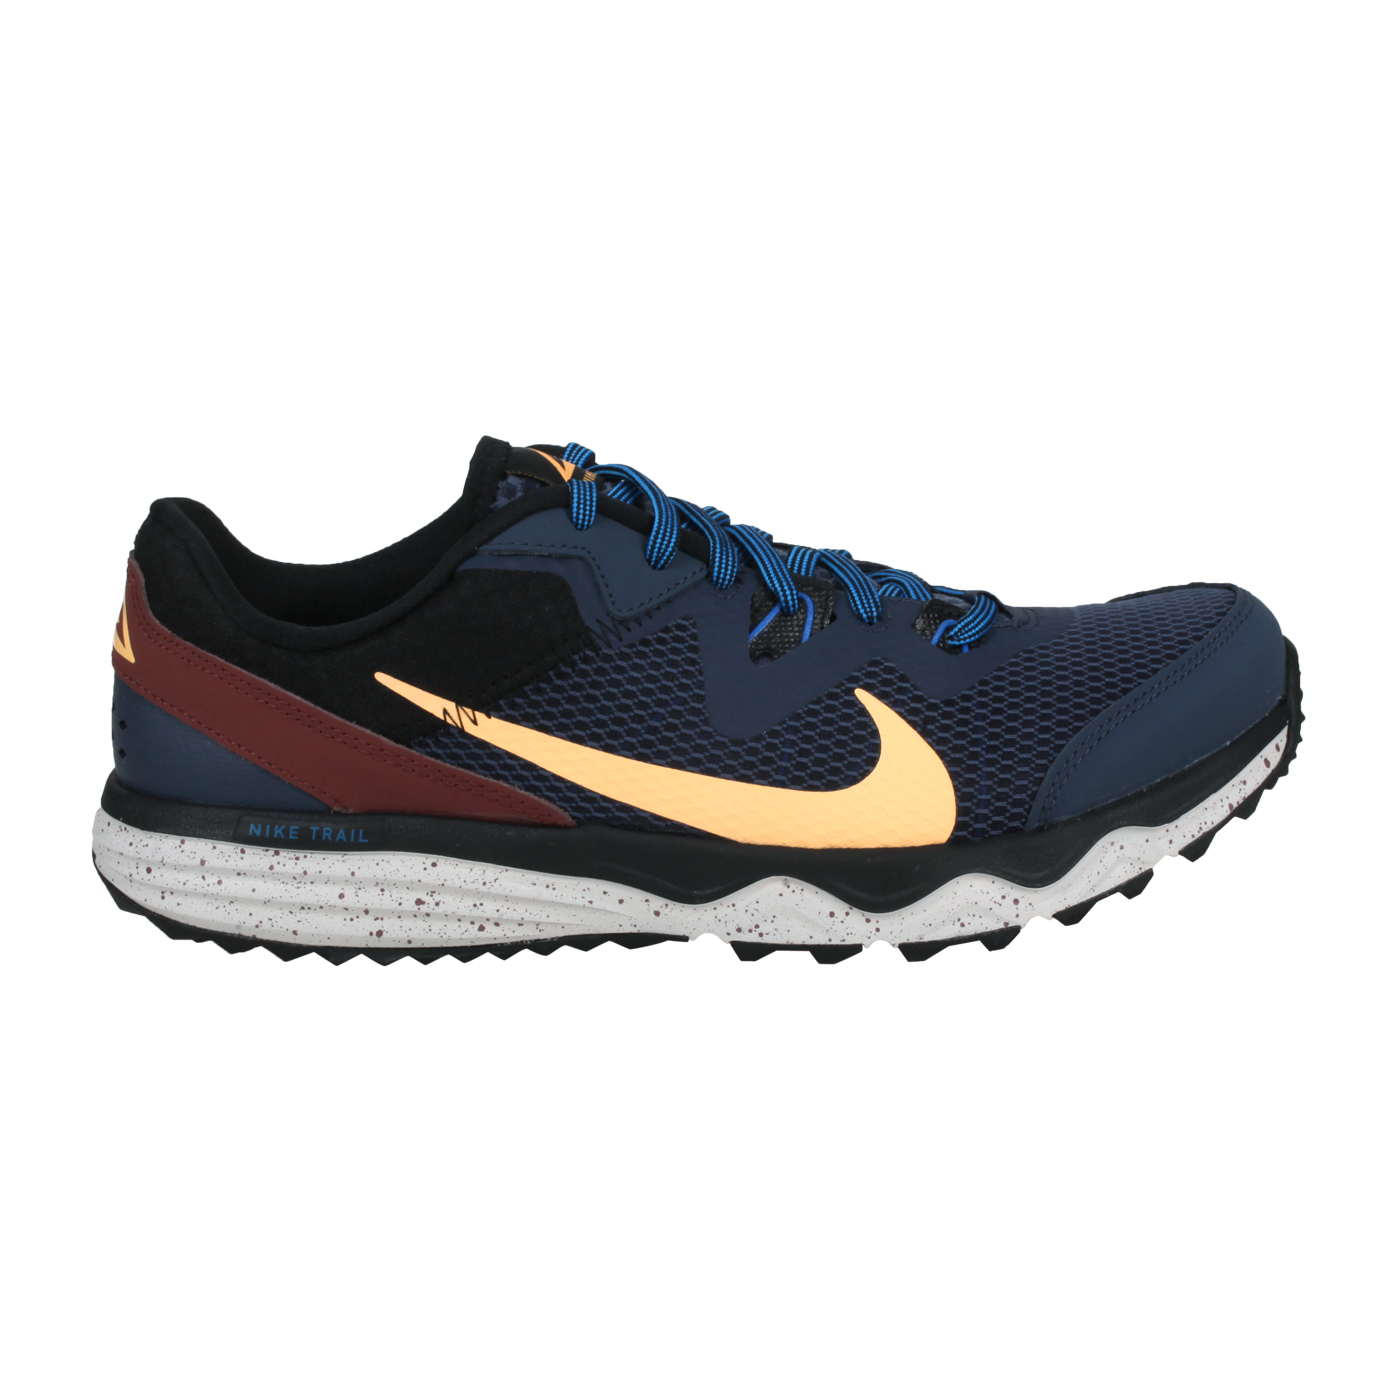 NIKE 男款慢跑鞋  @JUNIPER TRAIL@CW3808401 - 丈青淺黃棕